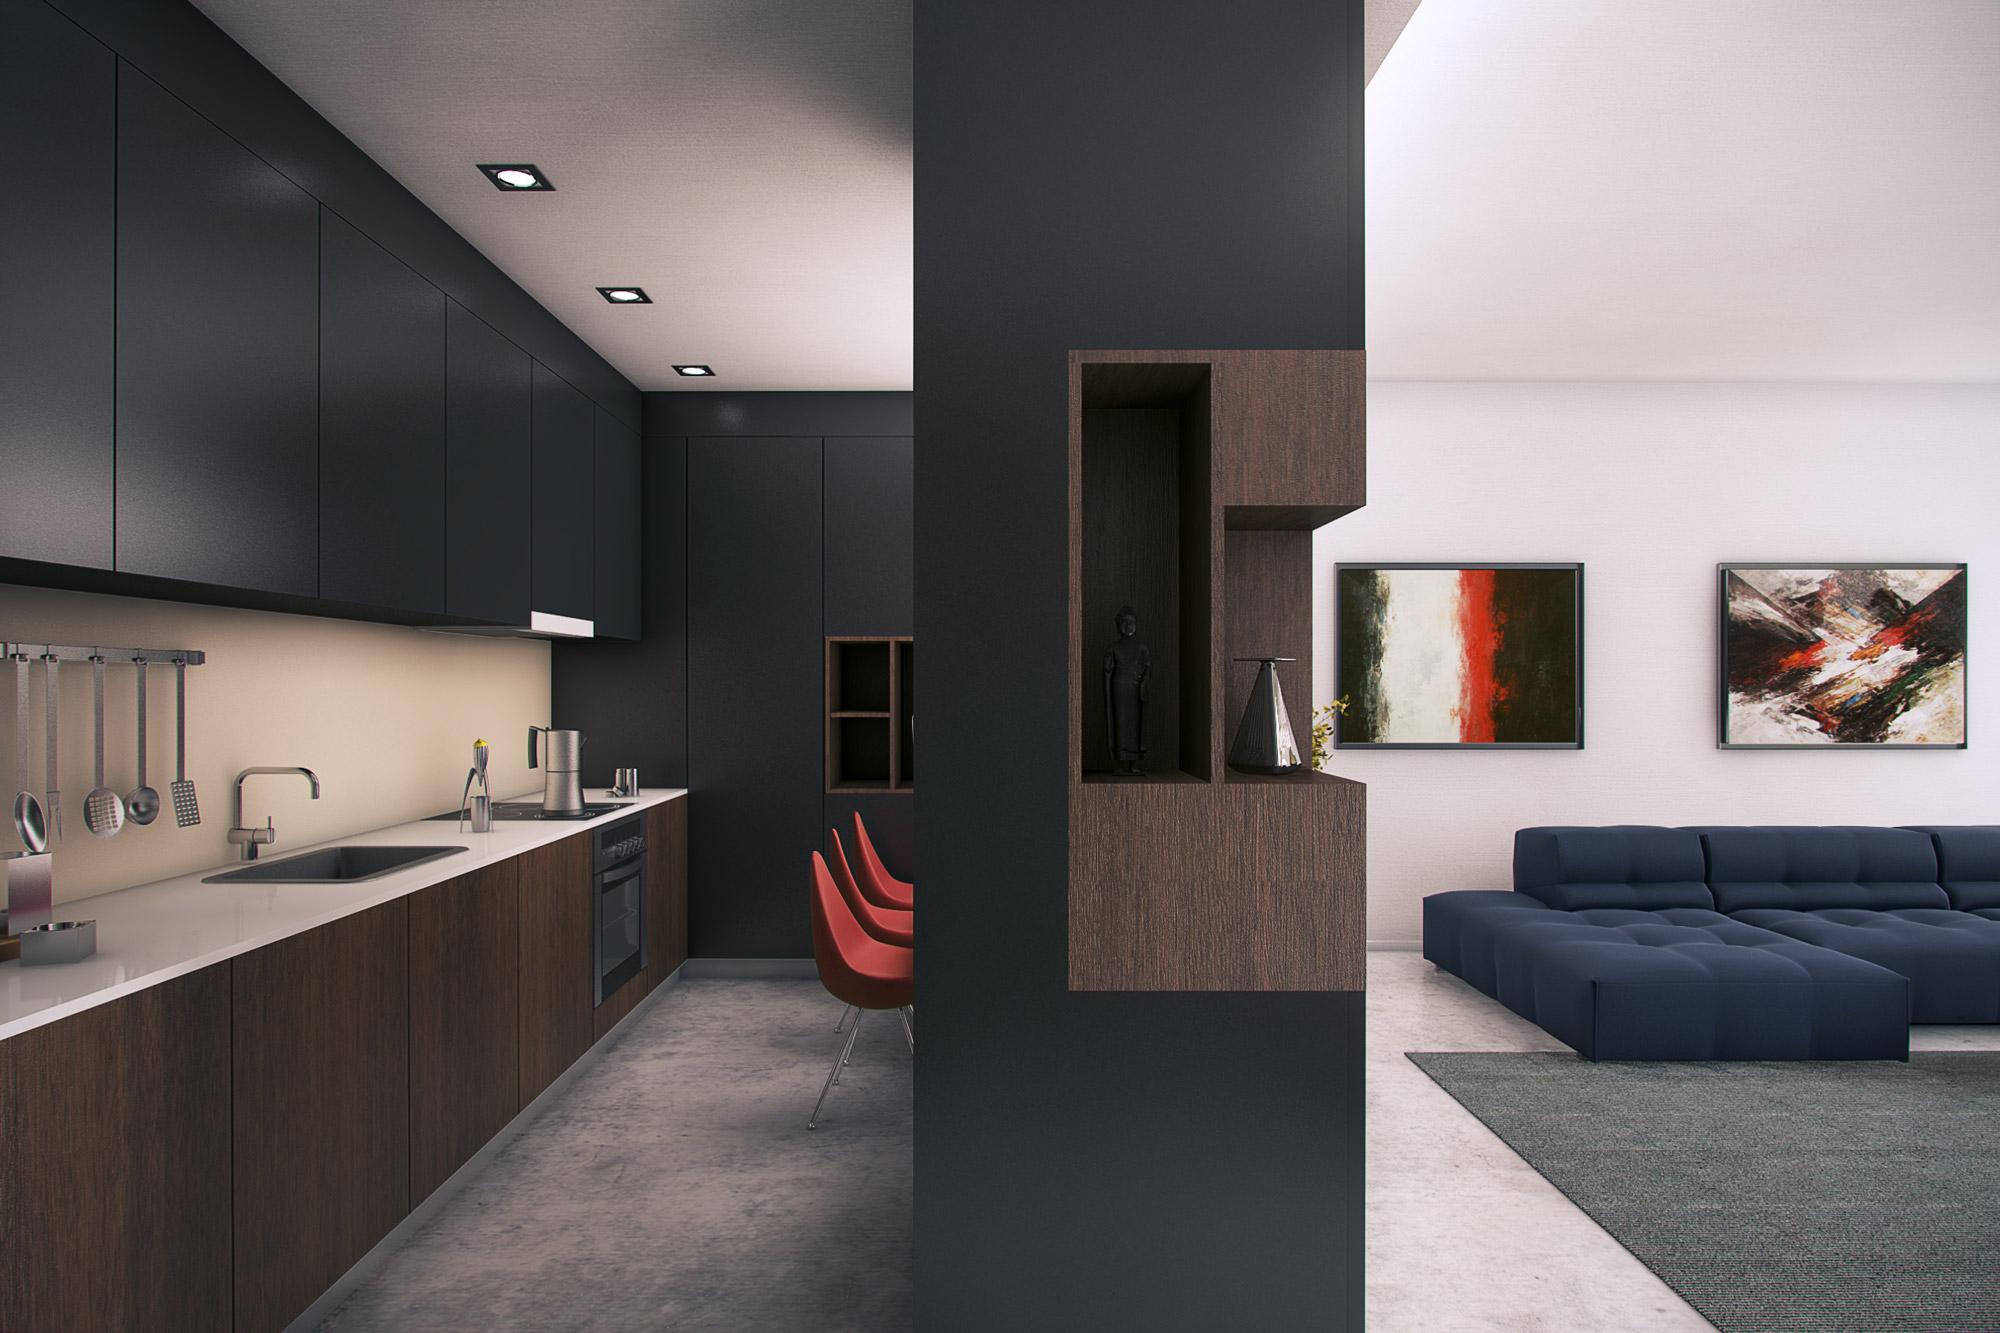 Apartment interior concept sofia kunchevarchdesign for Apartment design concepts pdf